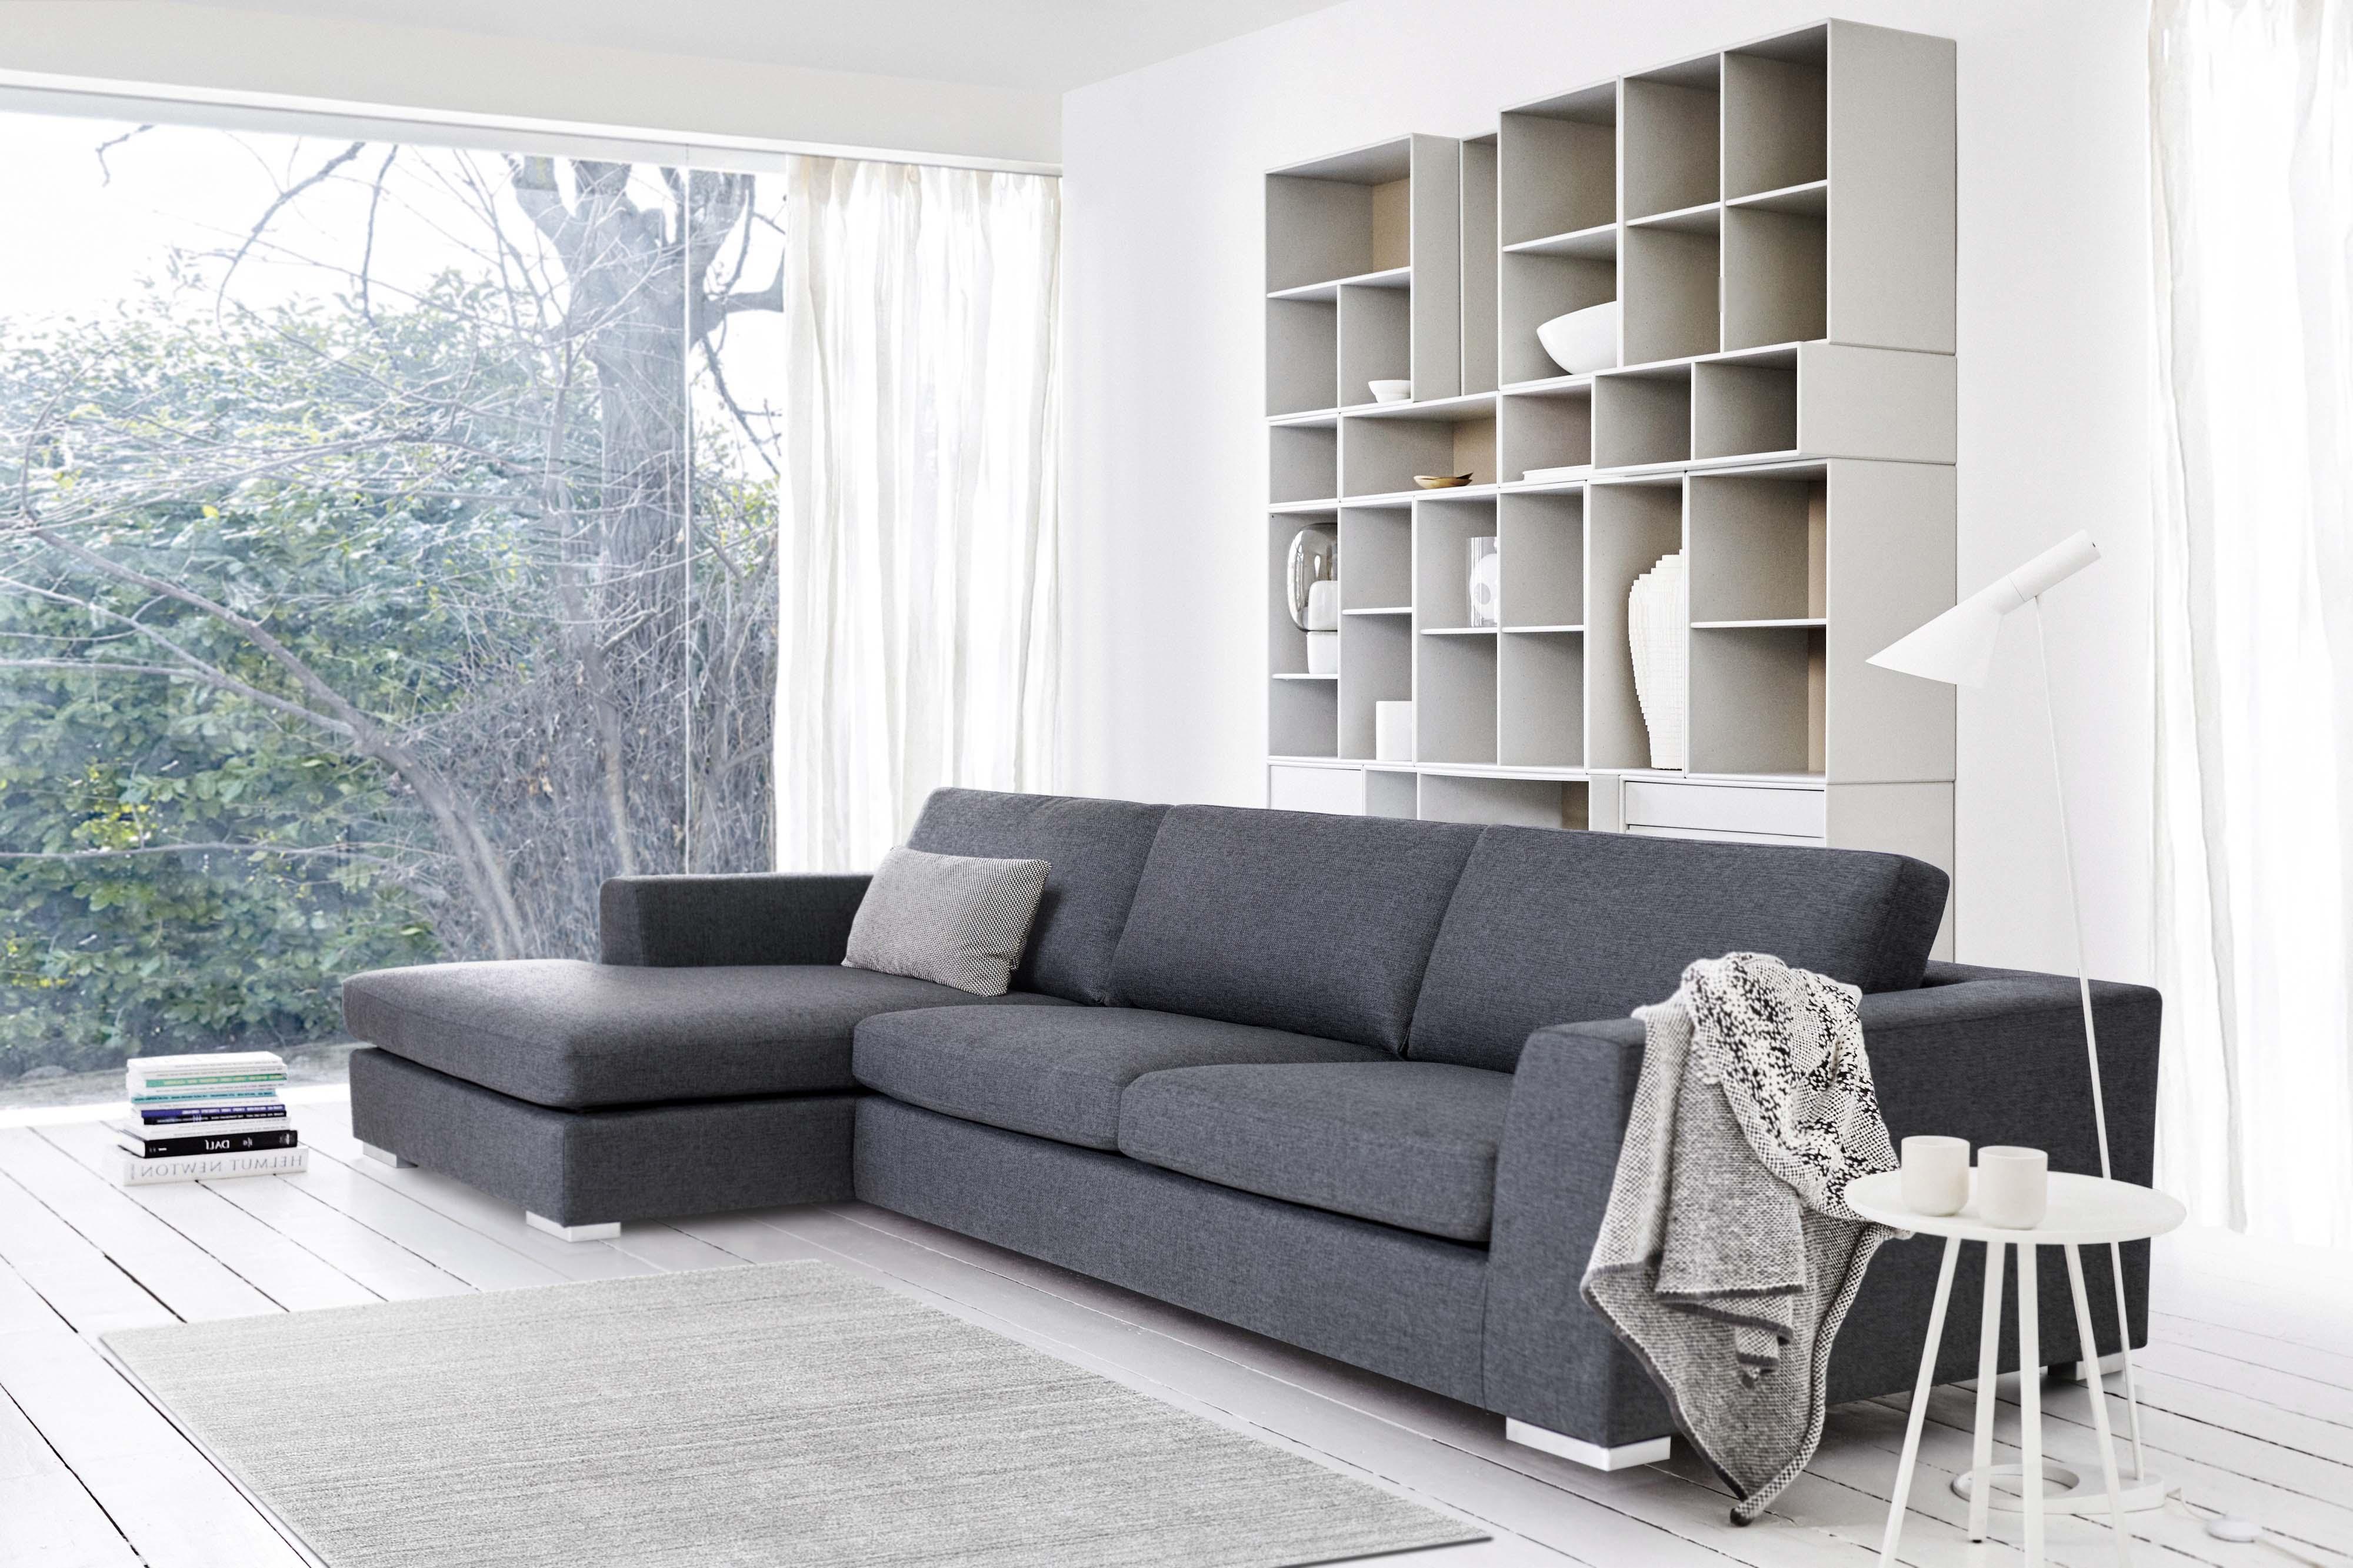 ecksofa david modisches zeitloses design stoff grau mdv h. Black Bedroom Furniture Sets. Home Design Ideas